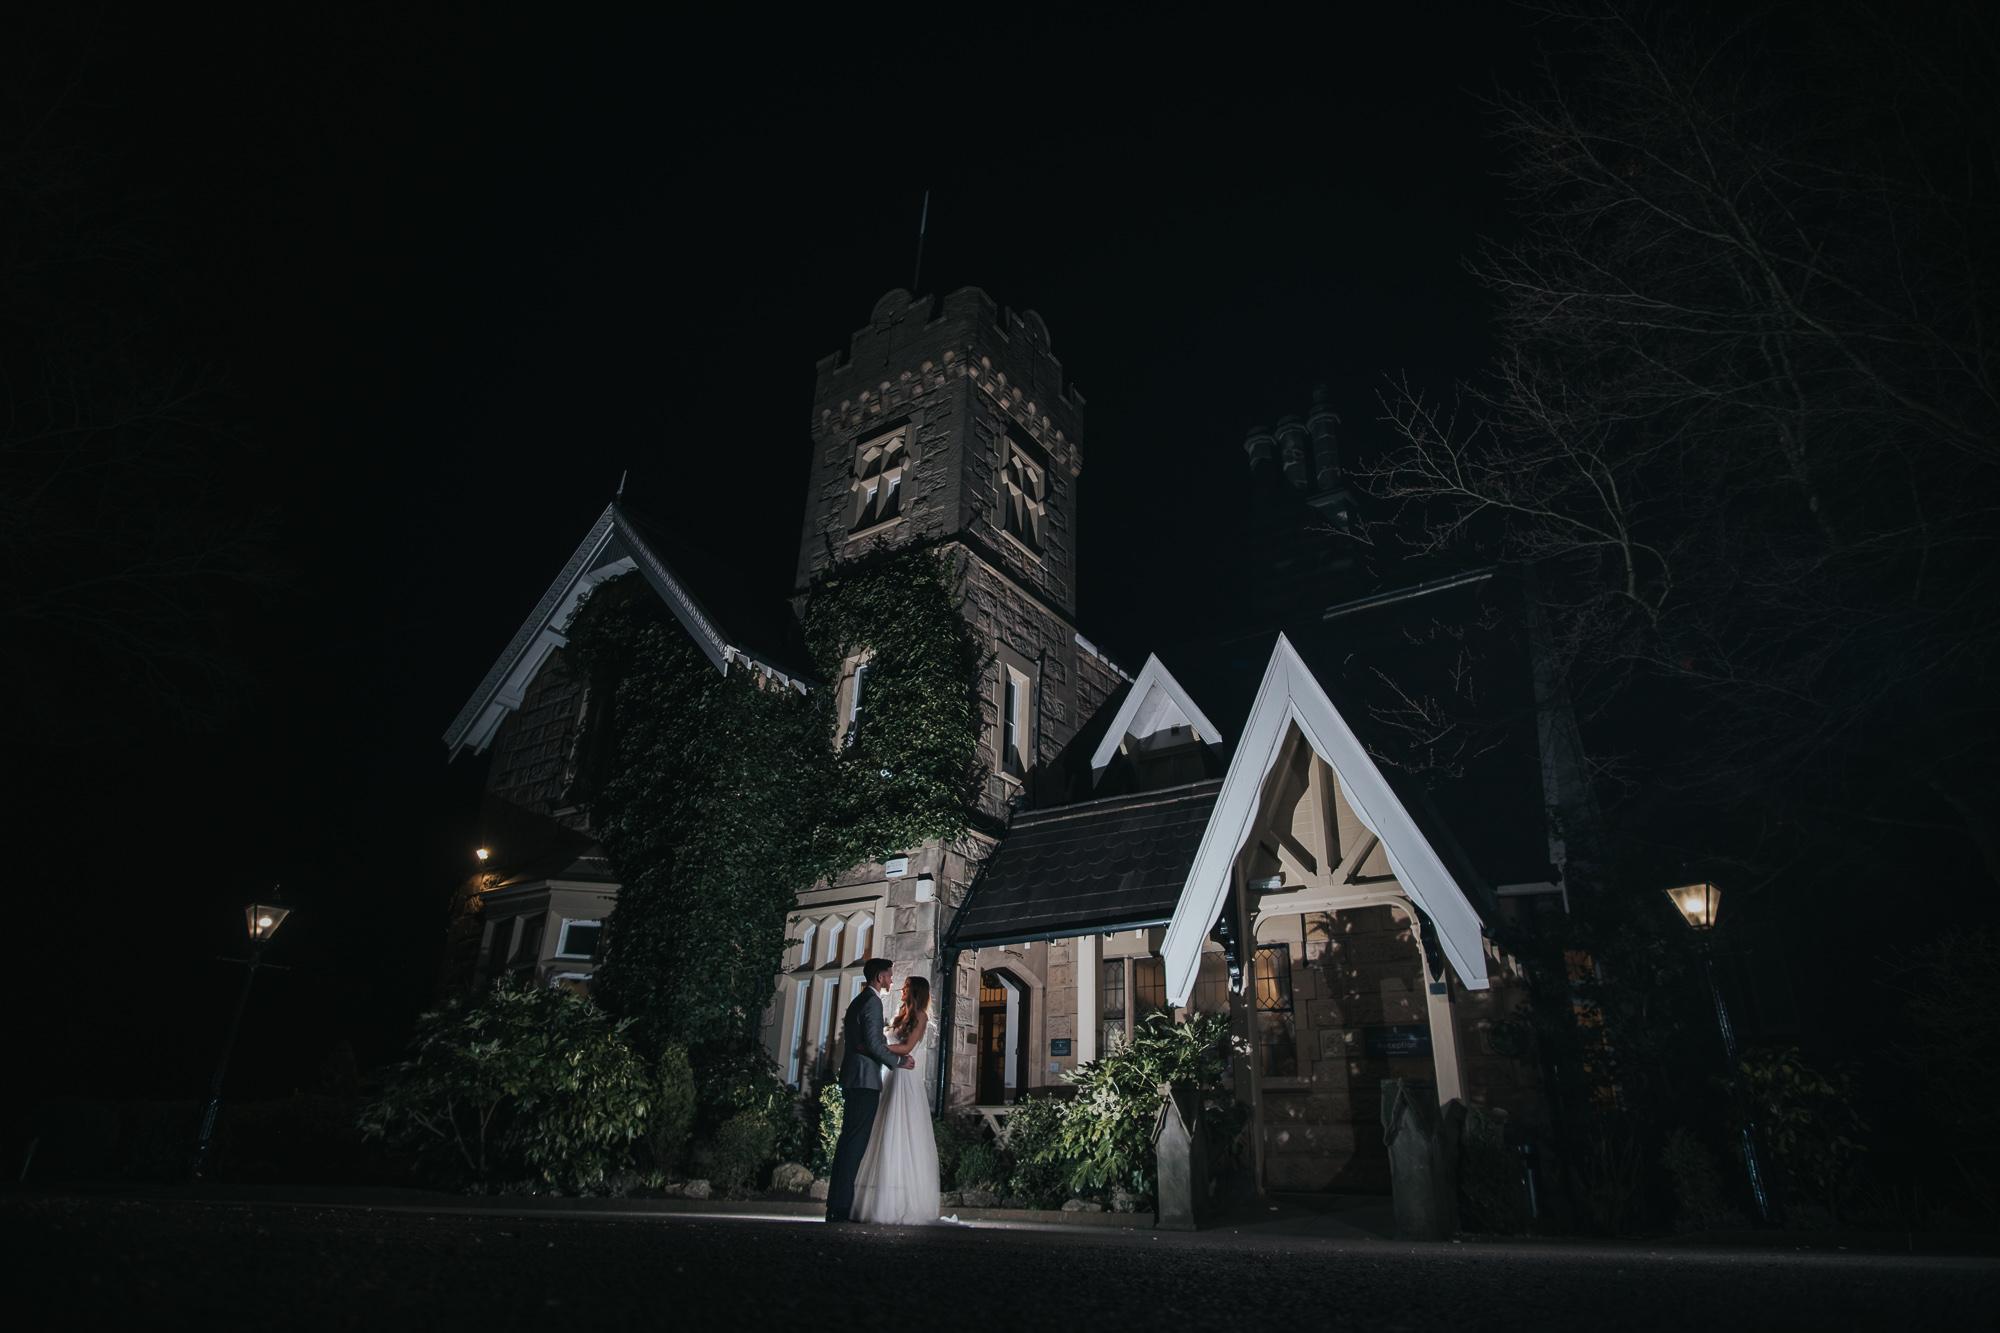 West Tower Exclusive Wedding Venue wedding photography merseyside and lancashire wedding photographer (53 of 60).jpg